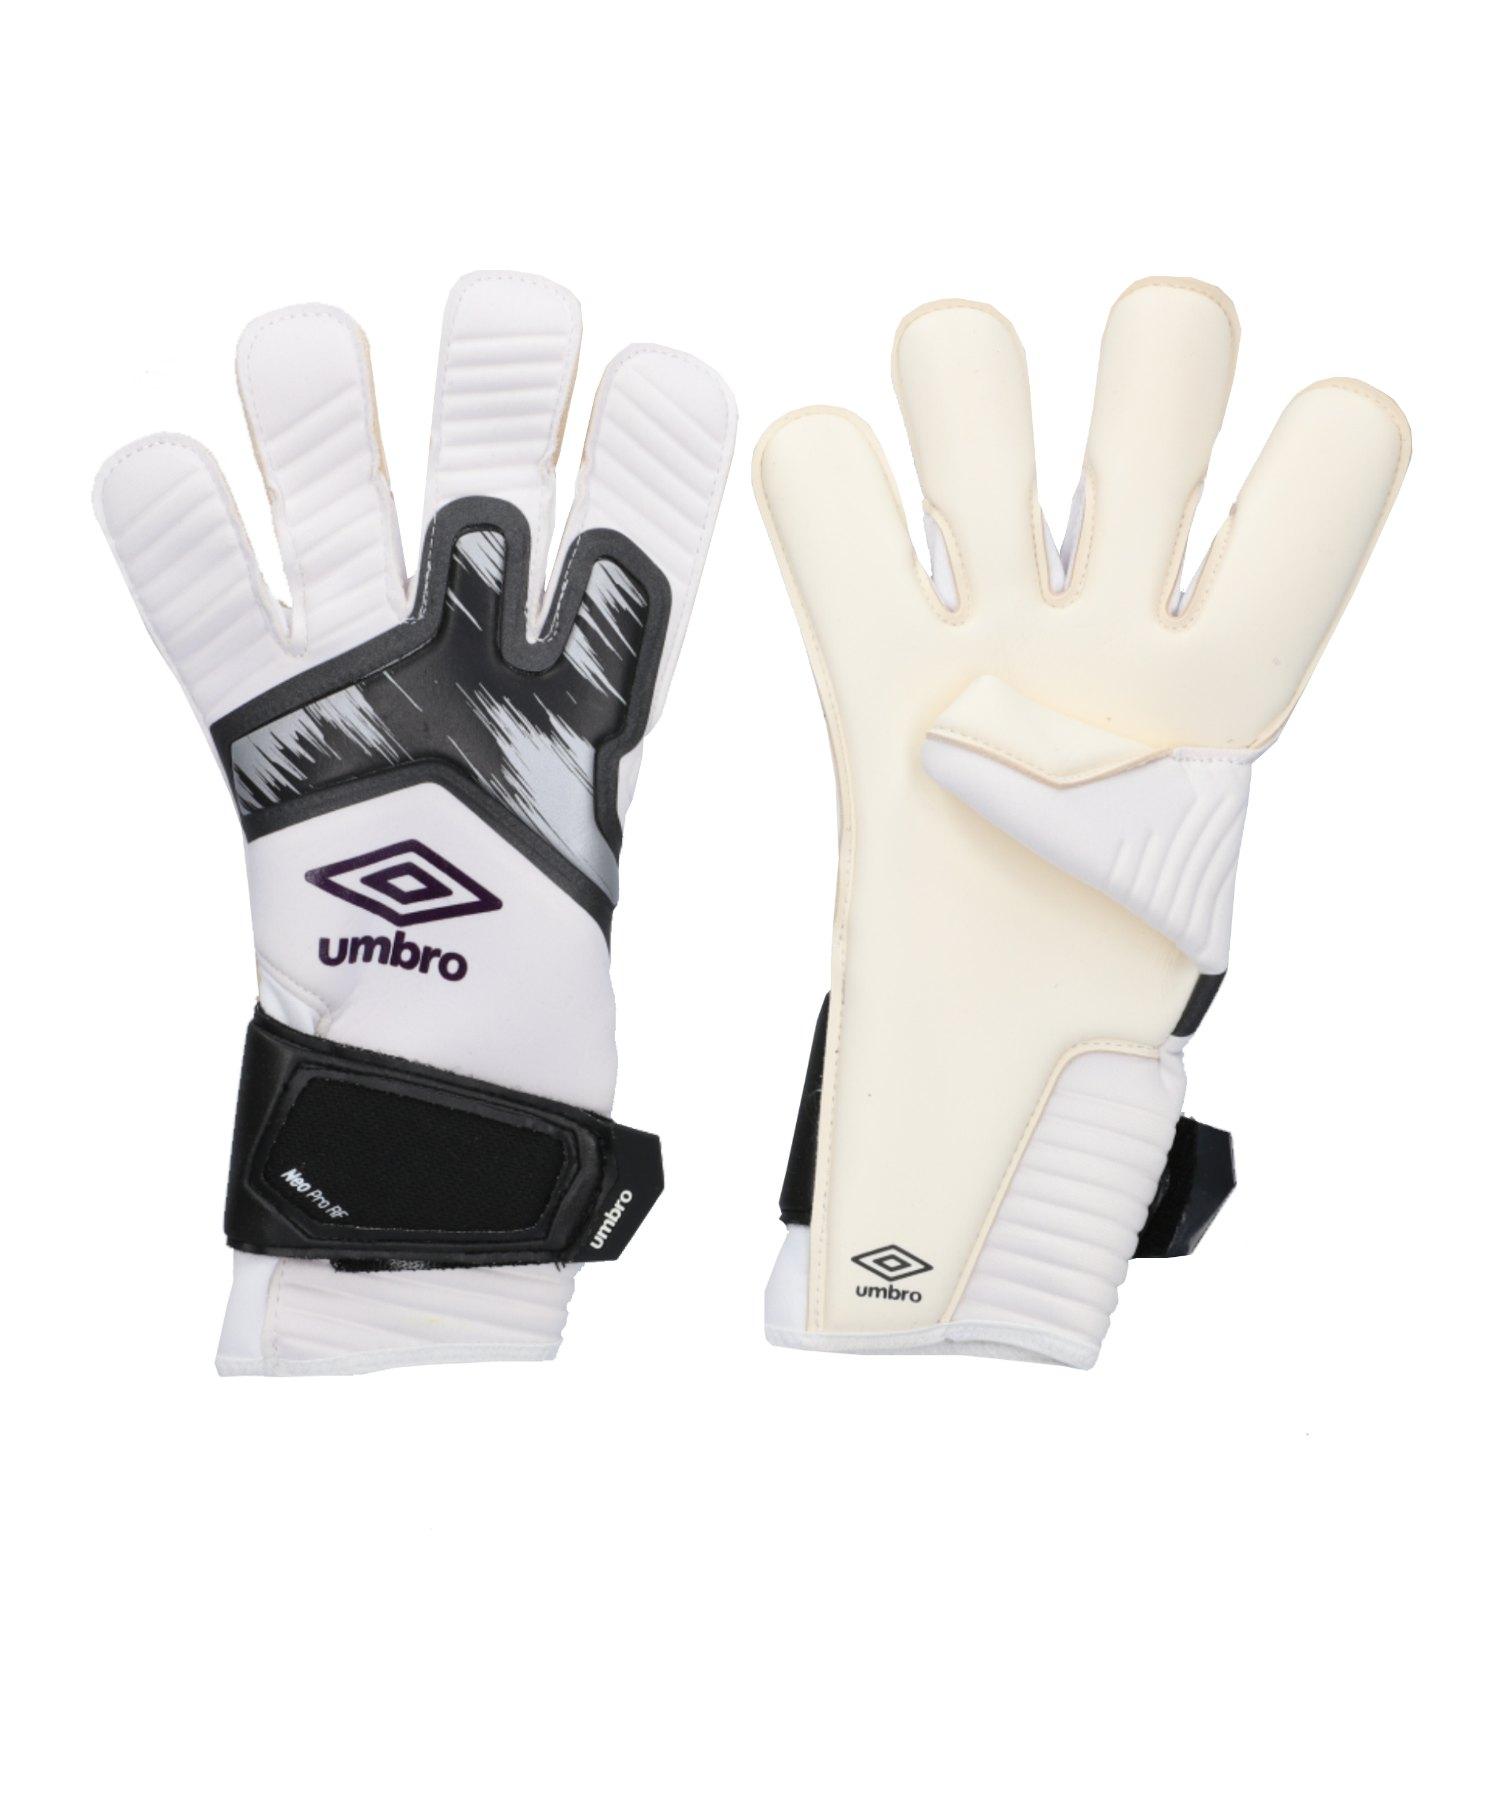 Umbro Neo Pro Rollfinger TW-Handschuh Weiss FHPQ - Weiss